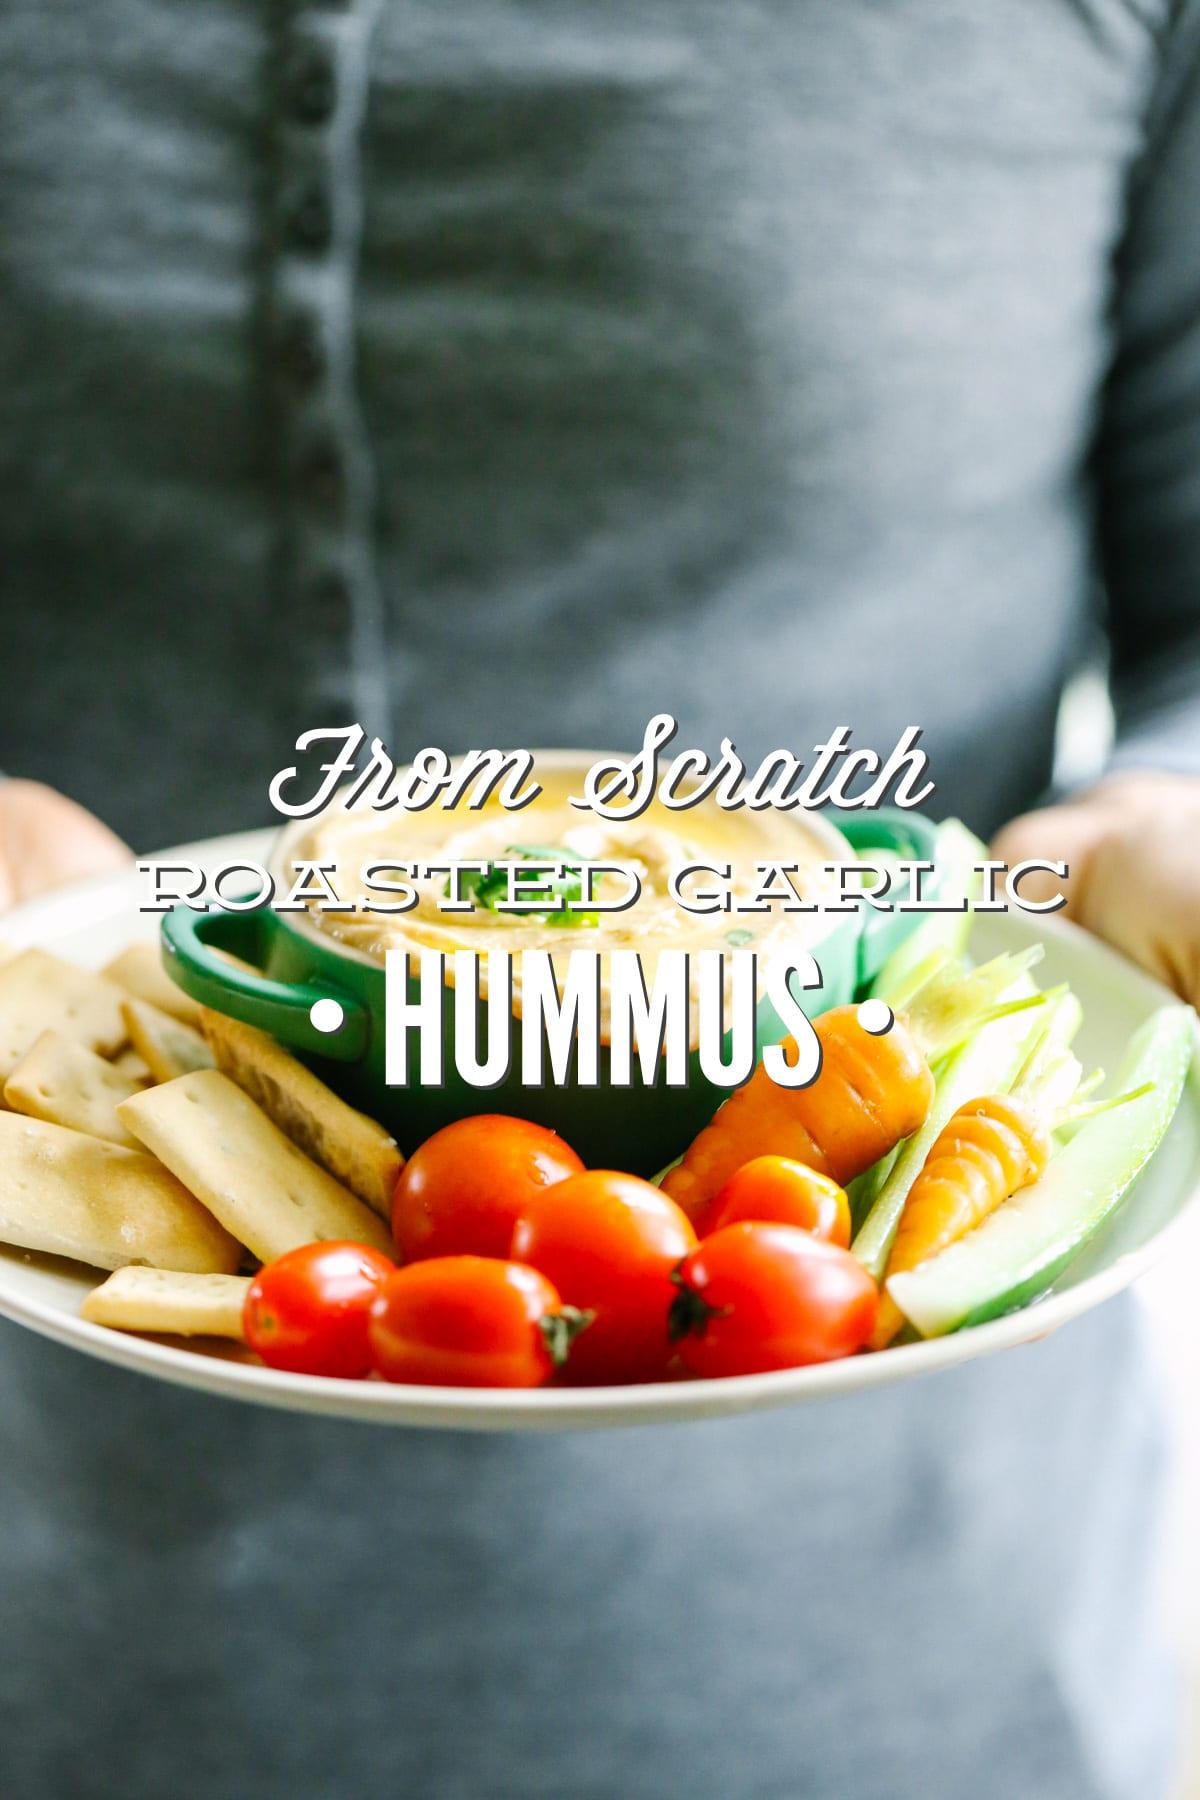 From Scratch Roasted Garlic Hummus